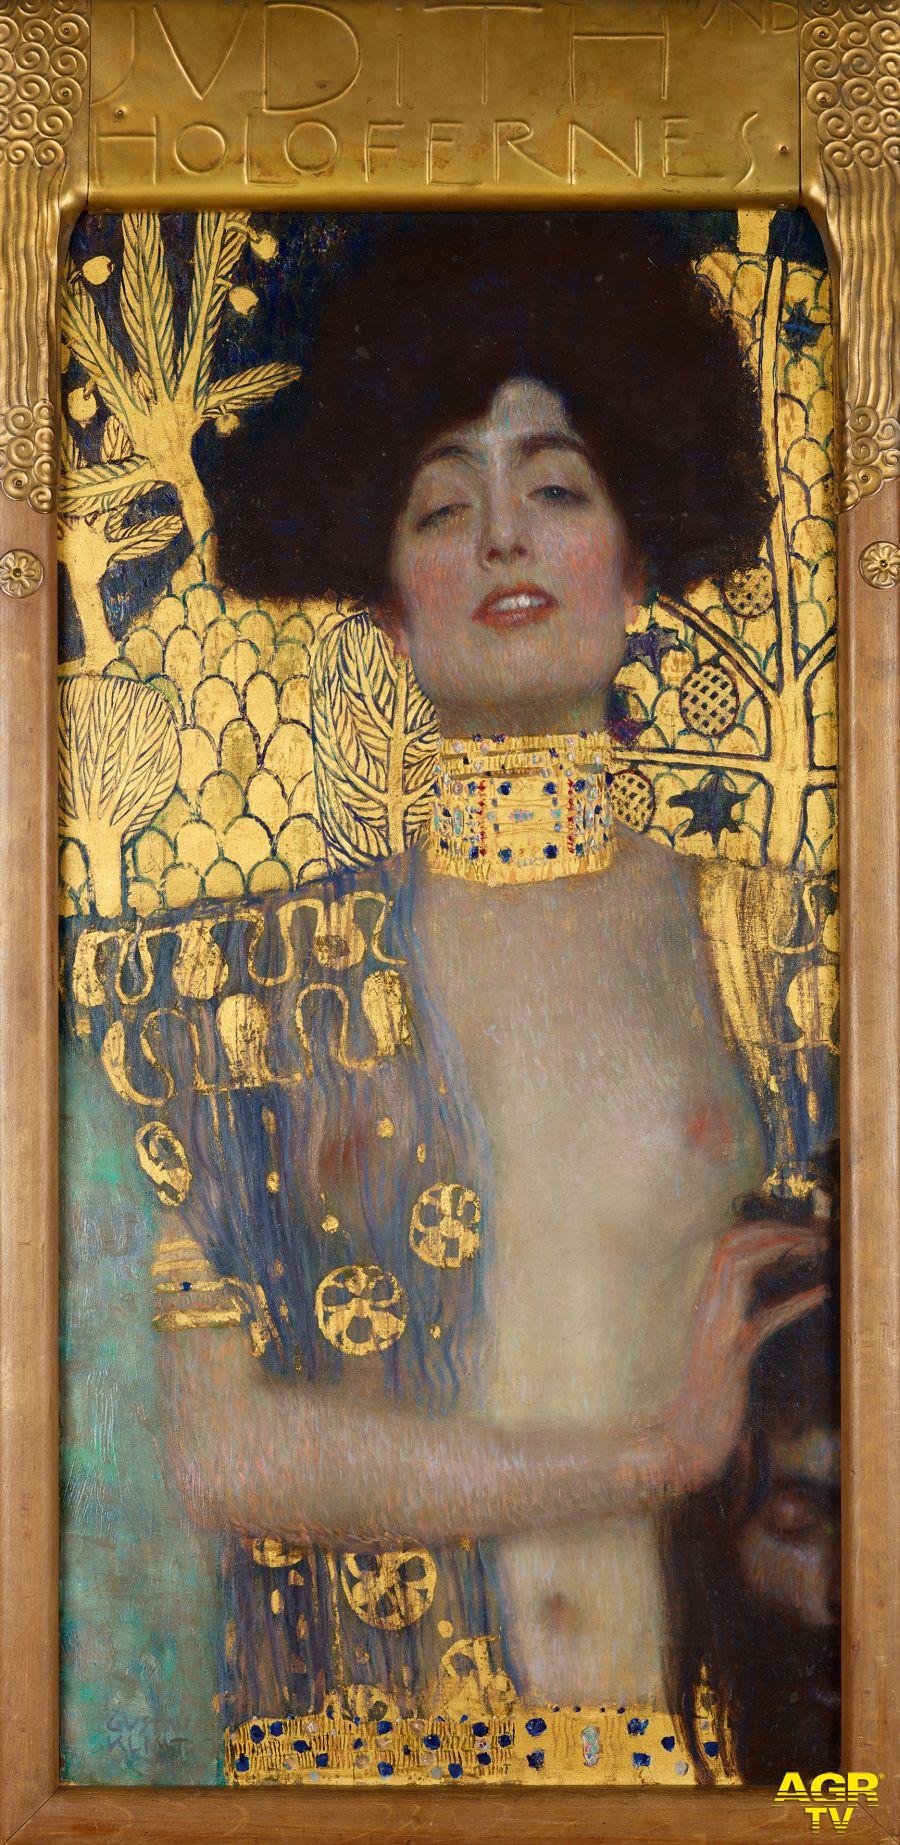 Roma. dopo centodieci anni, Gustav Klimt torna in Italia